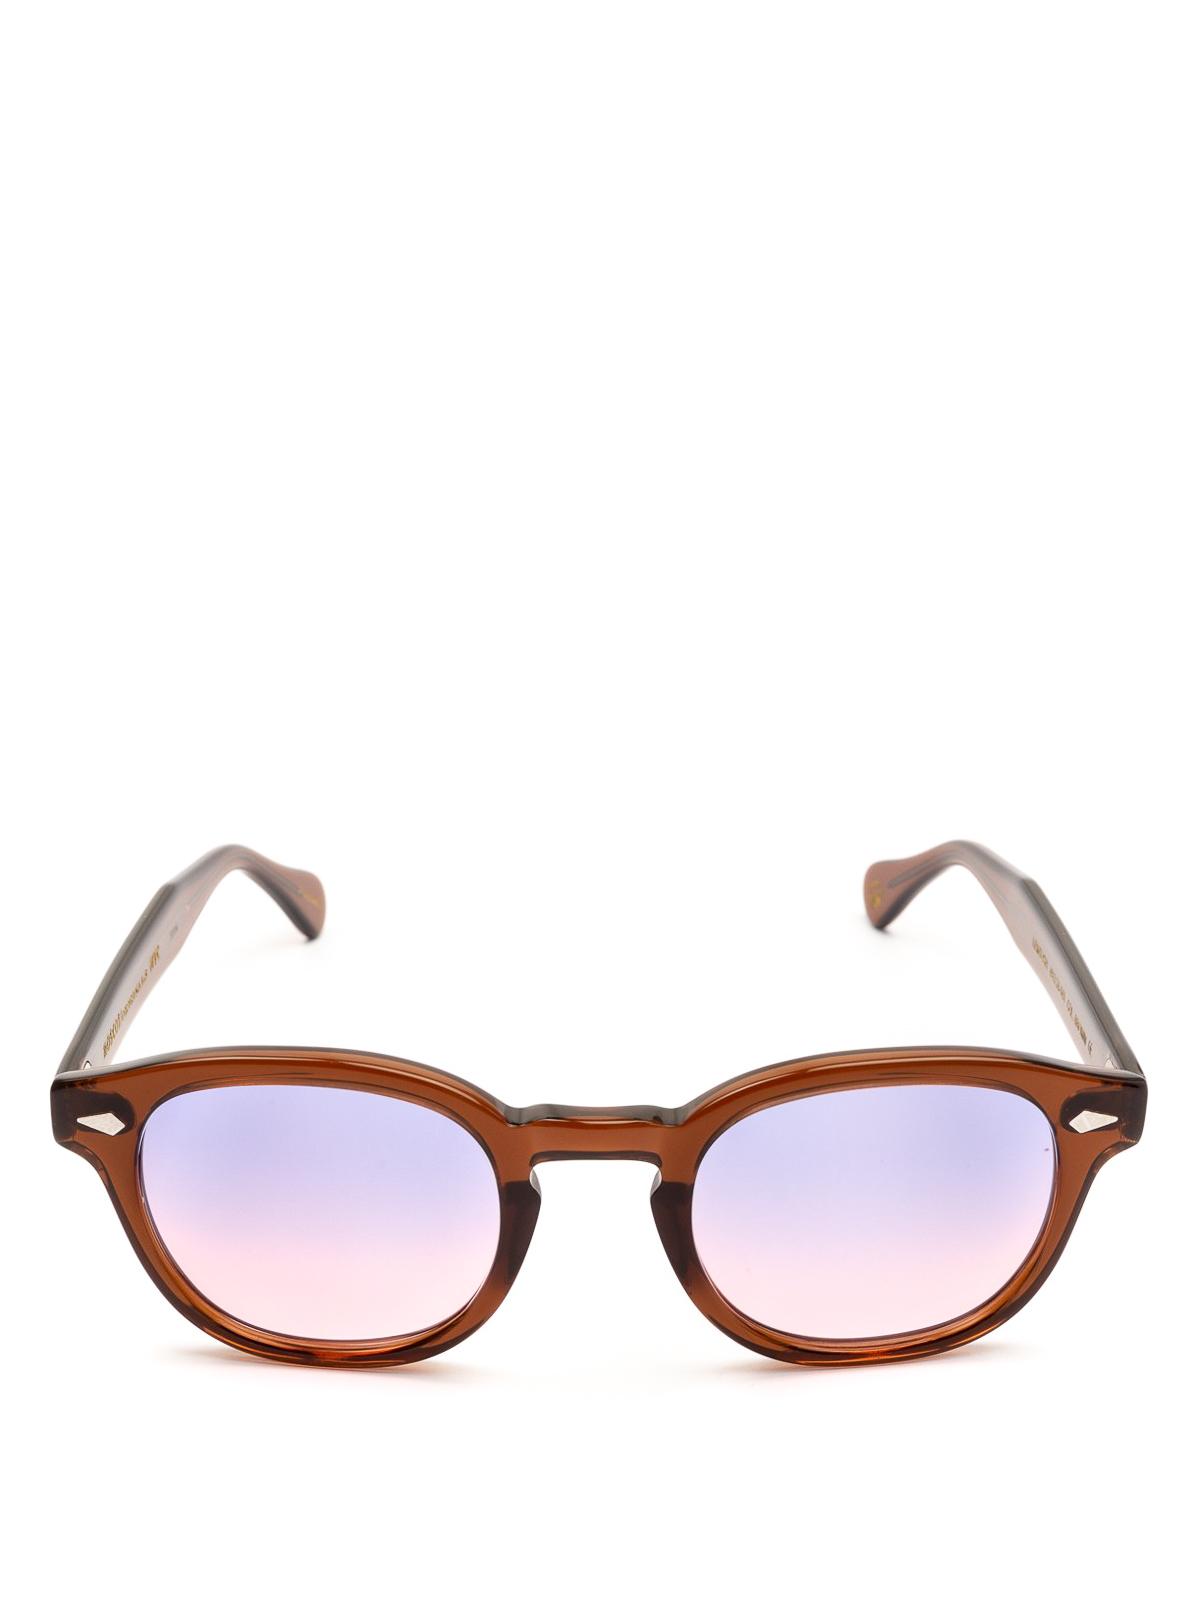 c36822ee0b8 MOSCOT  sunglasses online - Lemtosh purple pink lens brown sunglasses